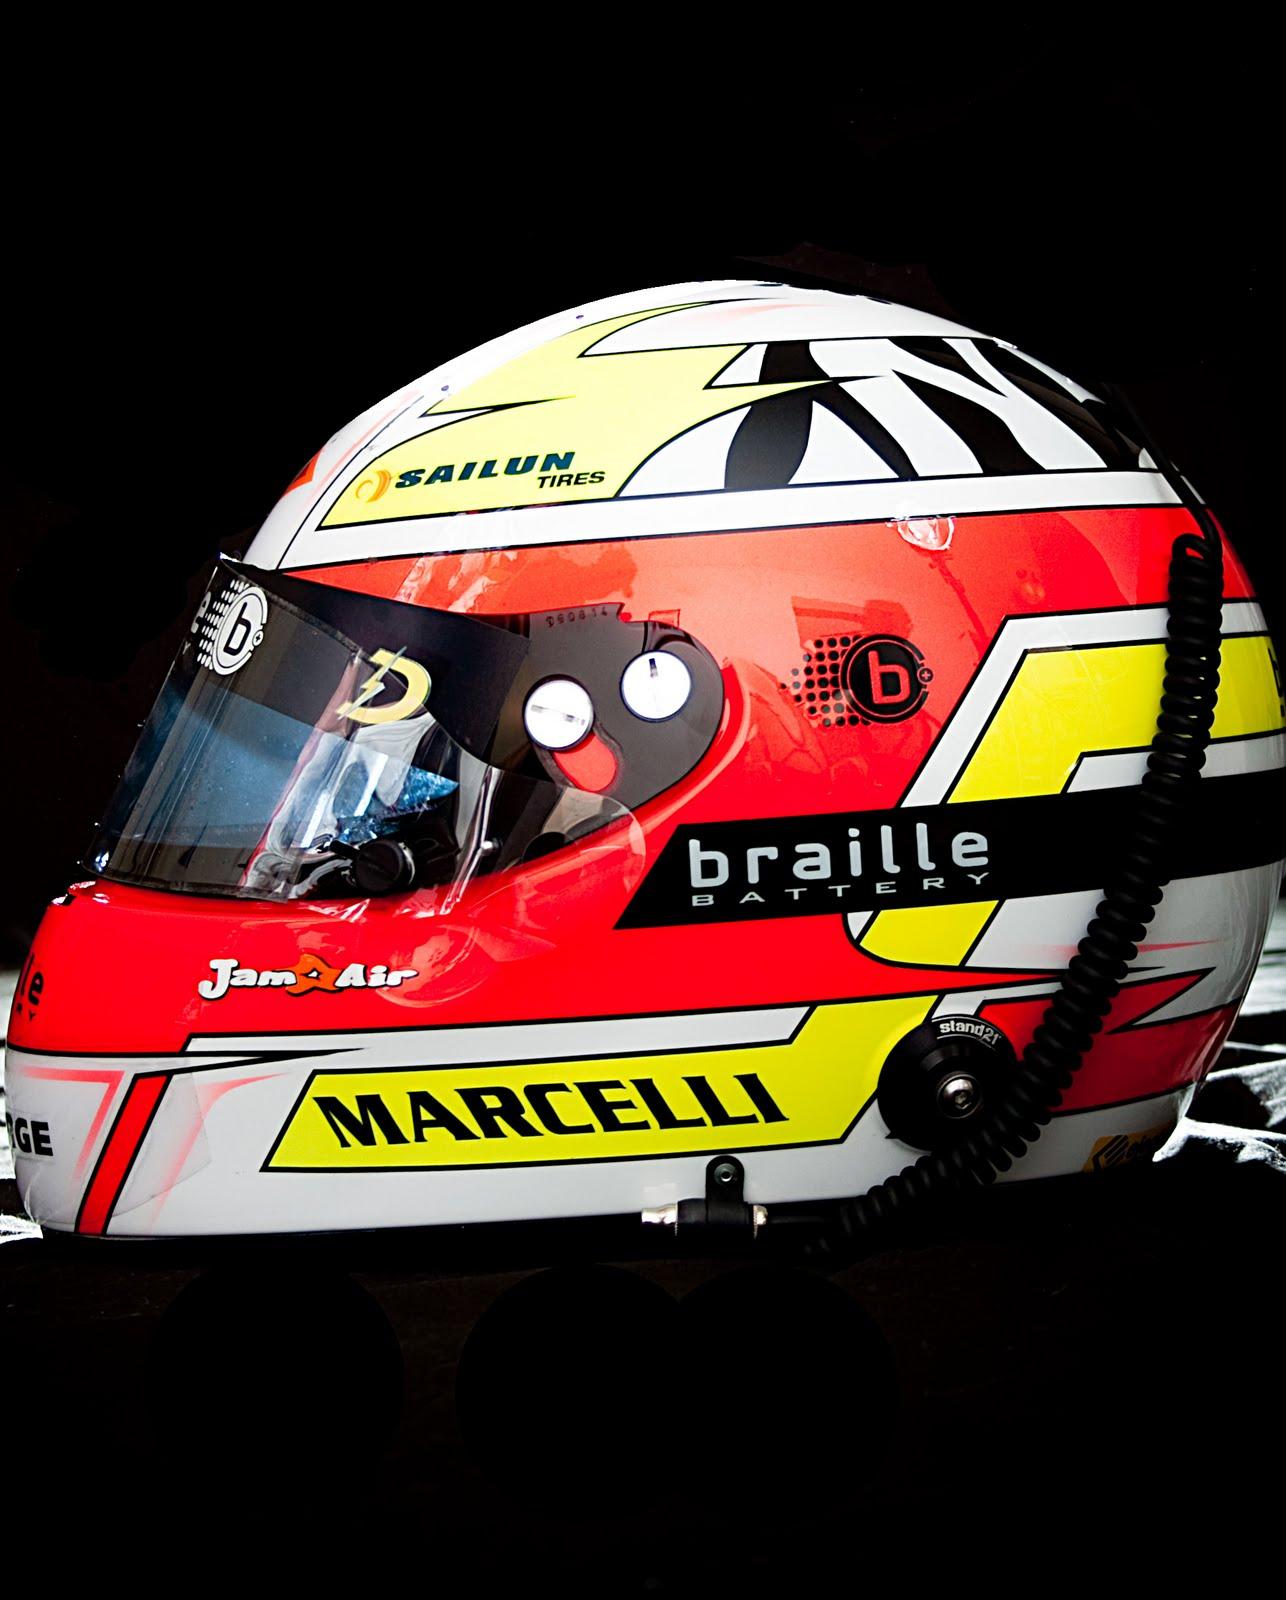 caleb morin photography kyle marcelli professional race car driver. Black Bedroom Furniture Sets. Home Design Ideas